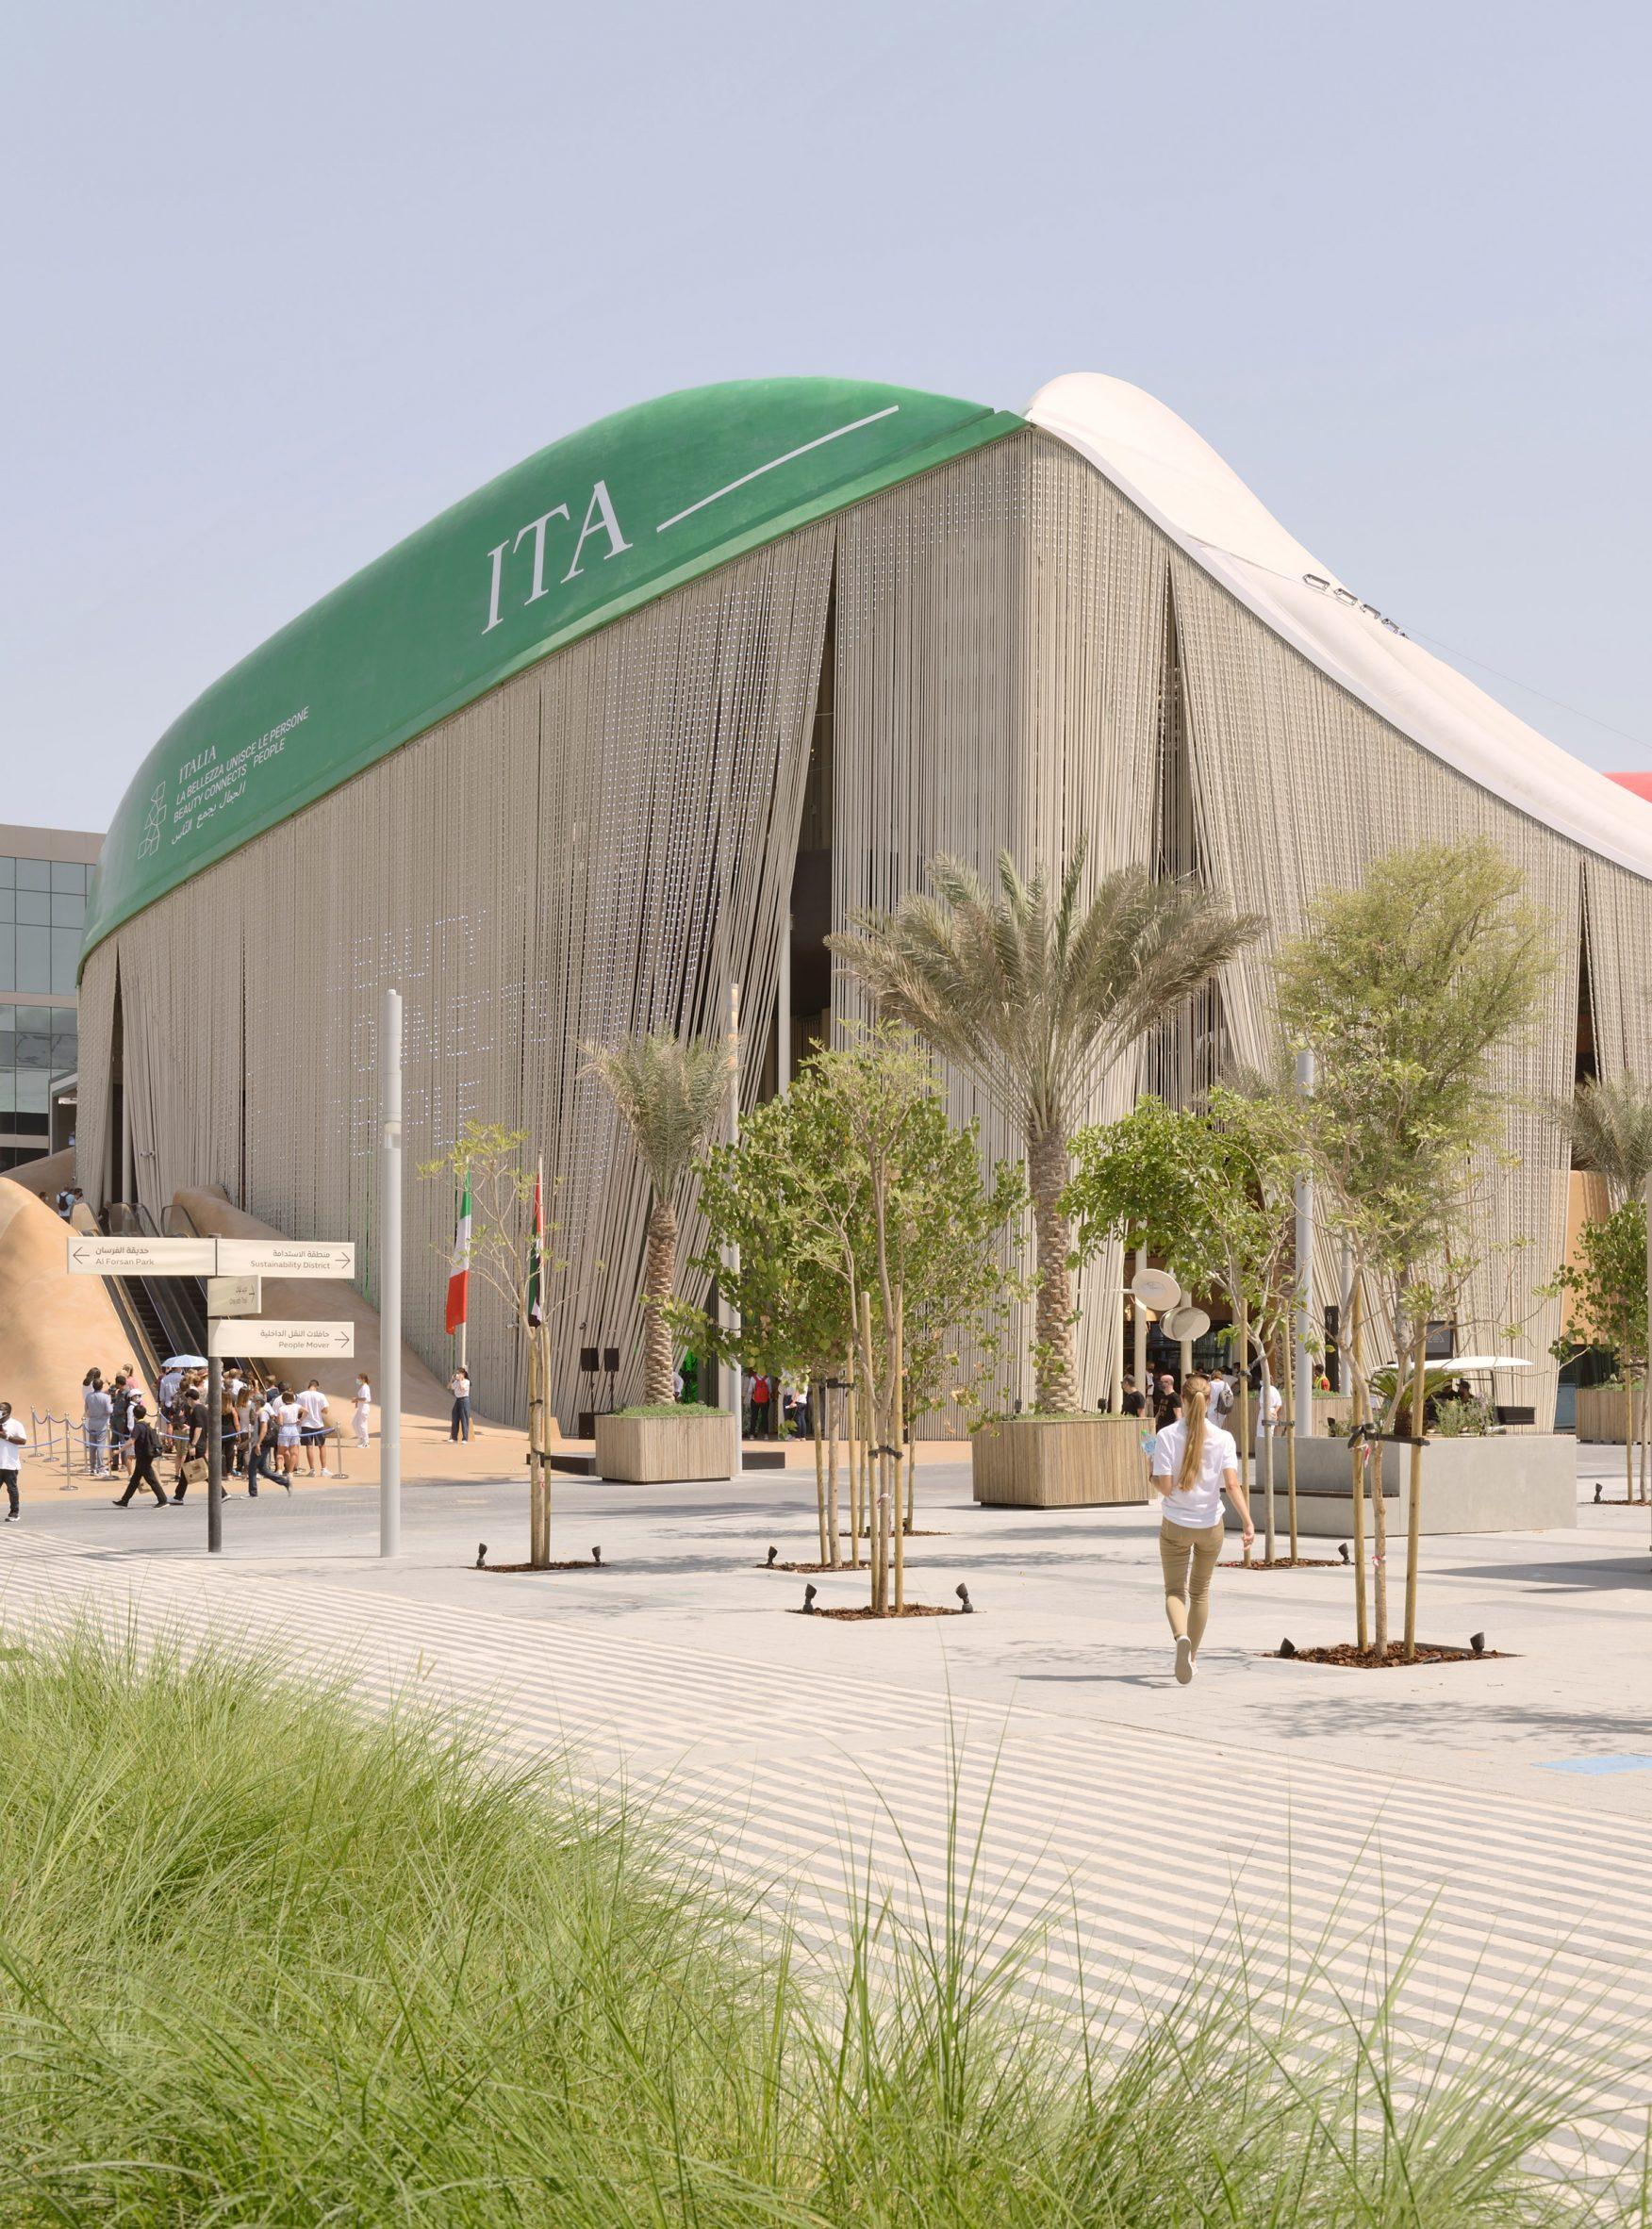 Italy Pavilion at Dubai Expo by Carlo Ratti